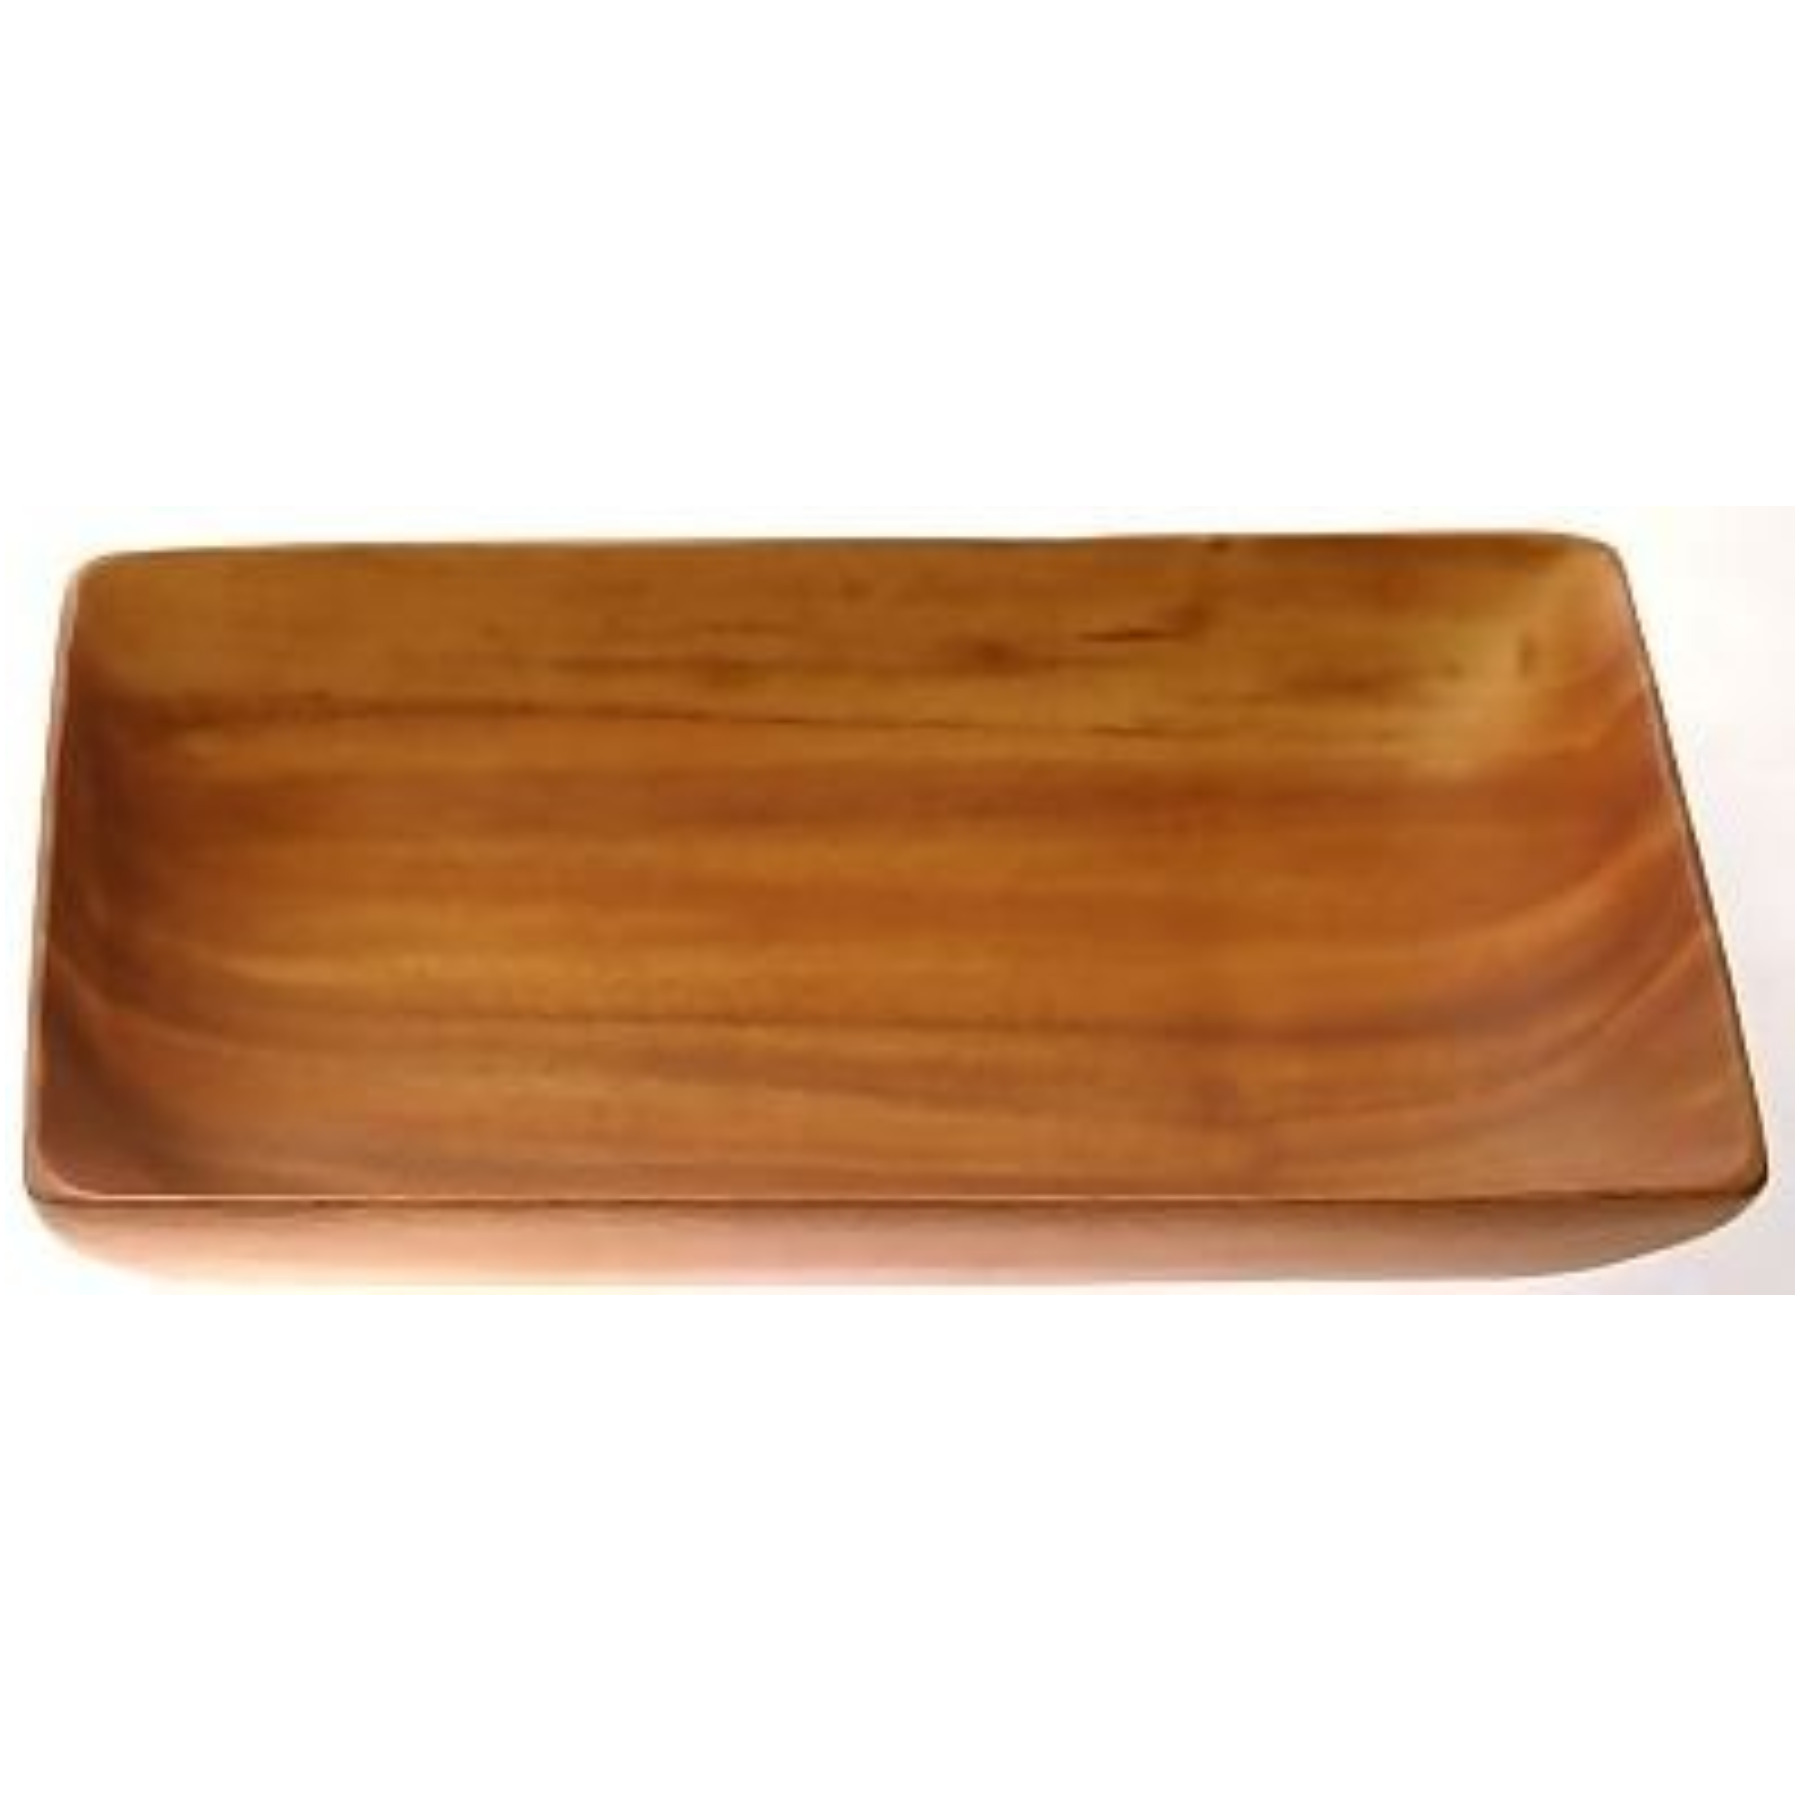 "Acacia Wood Serving Bowl 2"" x 6"" x 10"" by Islander"